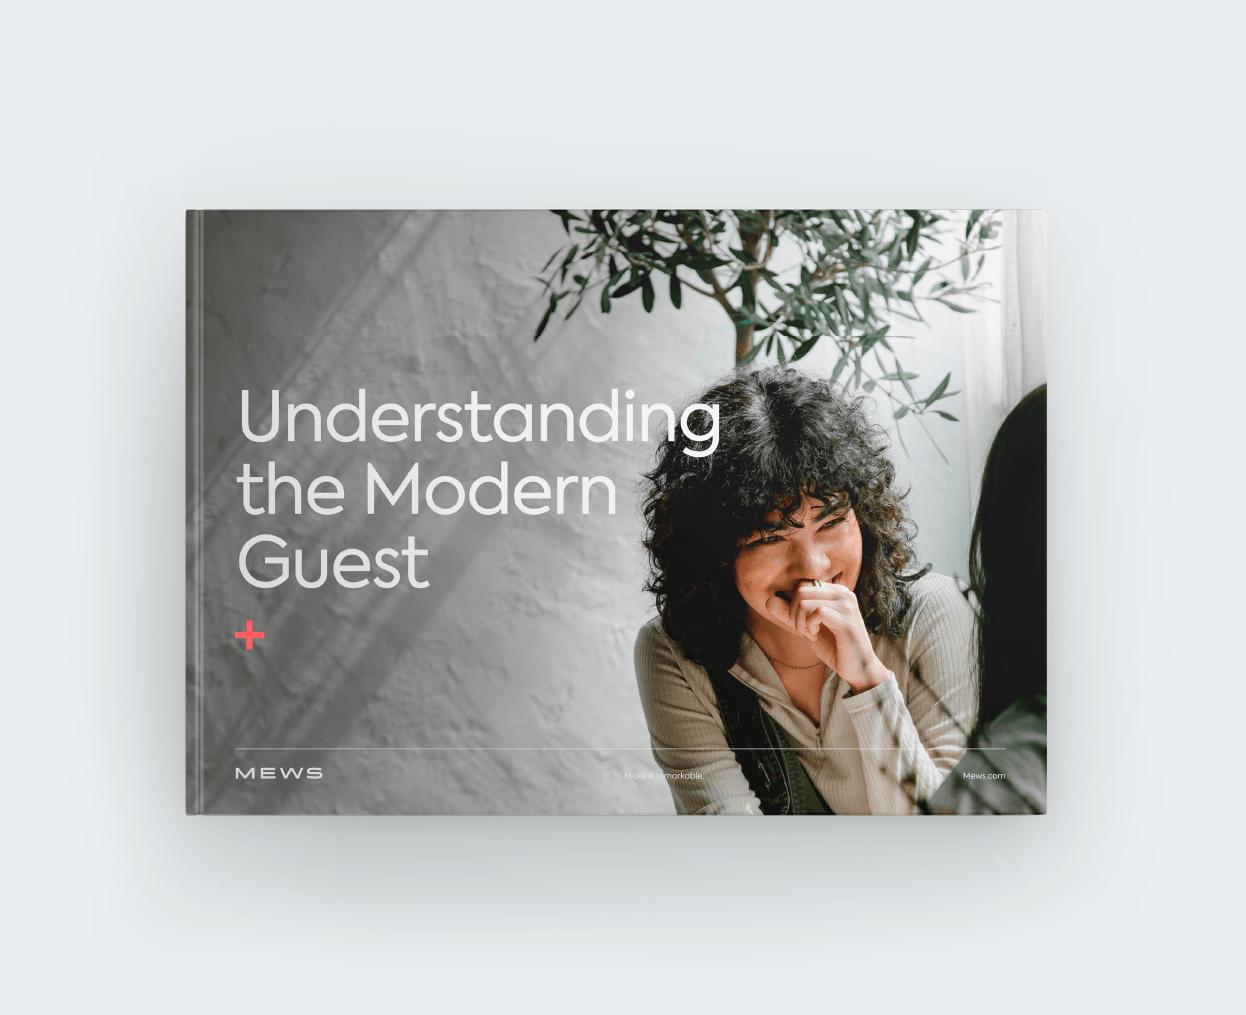 Understanding the modern gust_Hero - 1245x1014